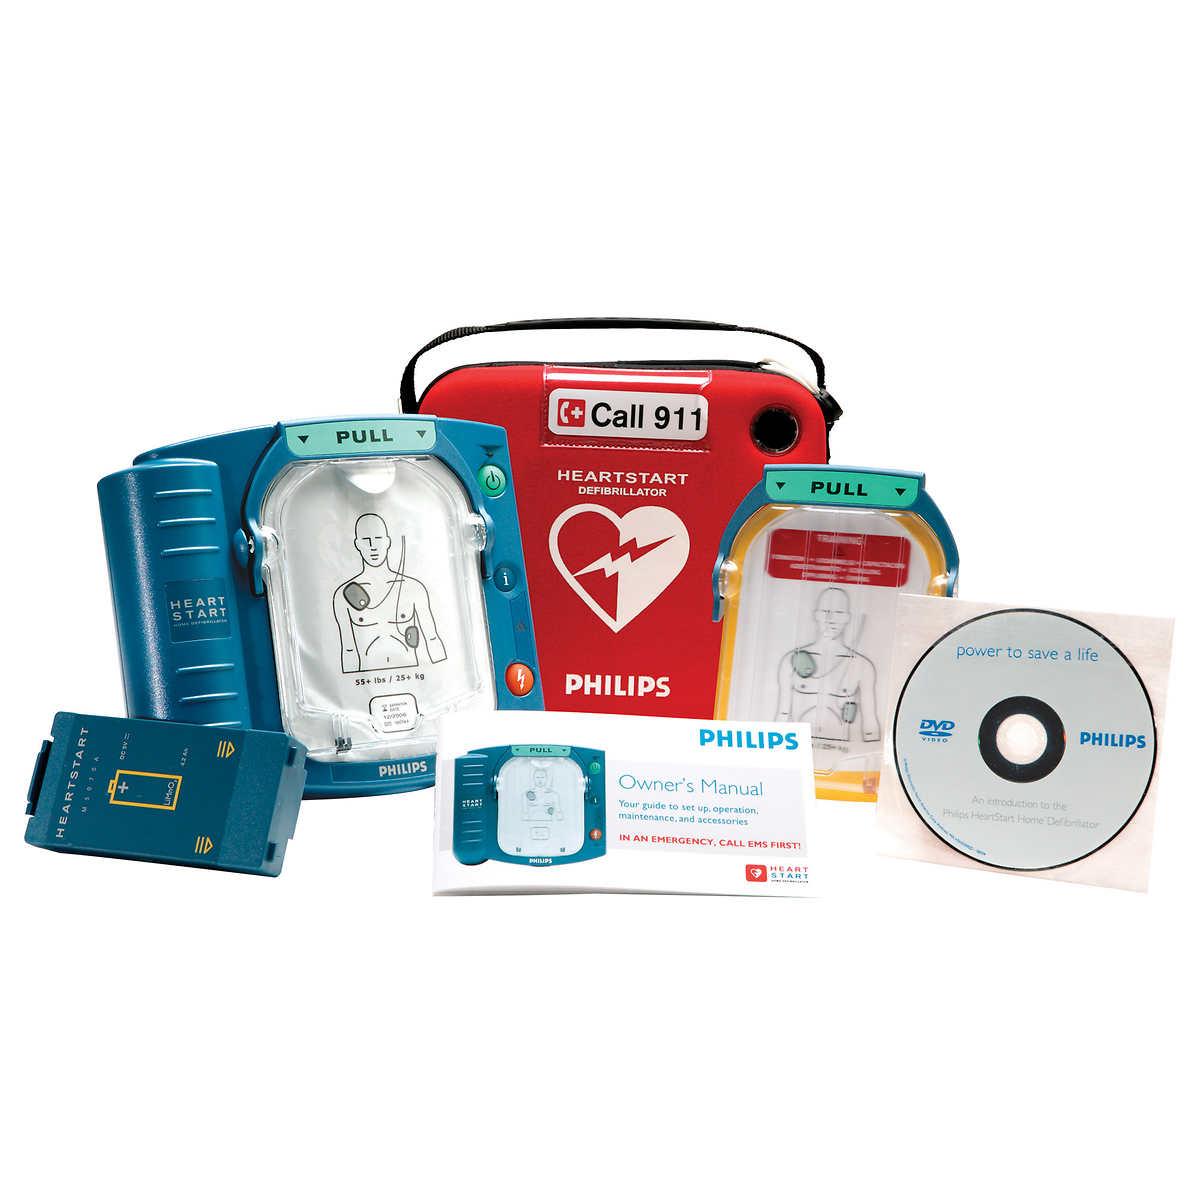 Philips® HeartStart Home Defibrillator - English or French